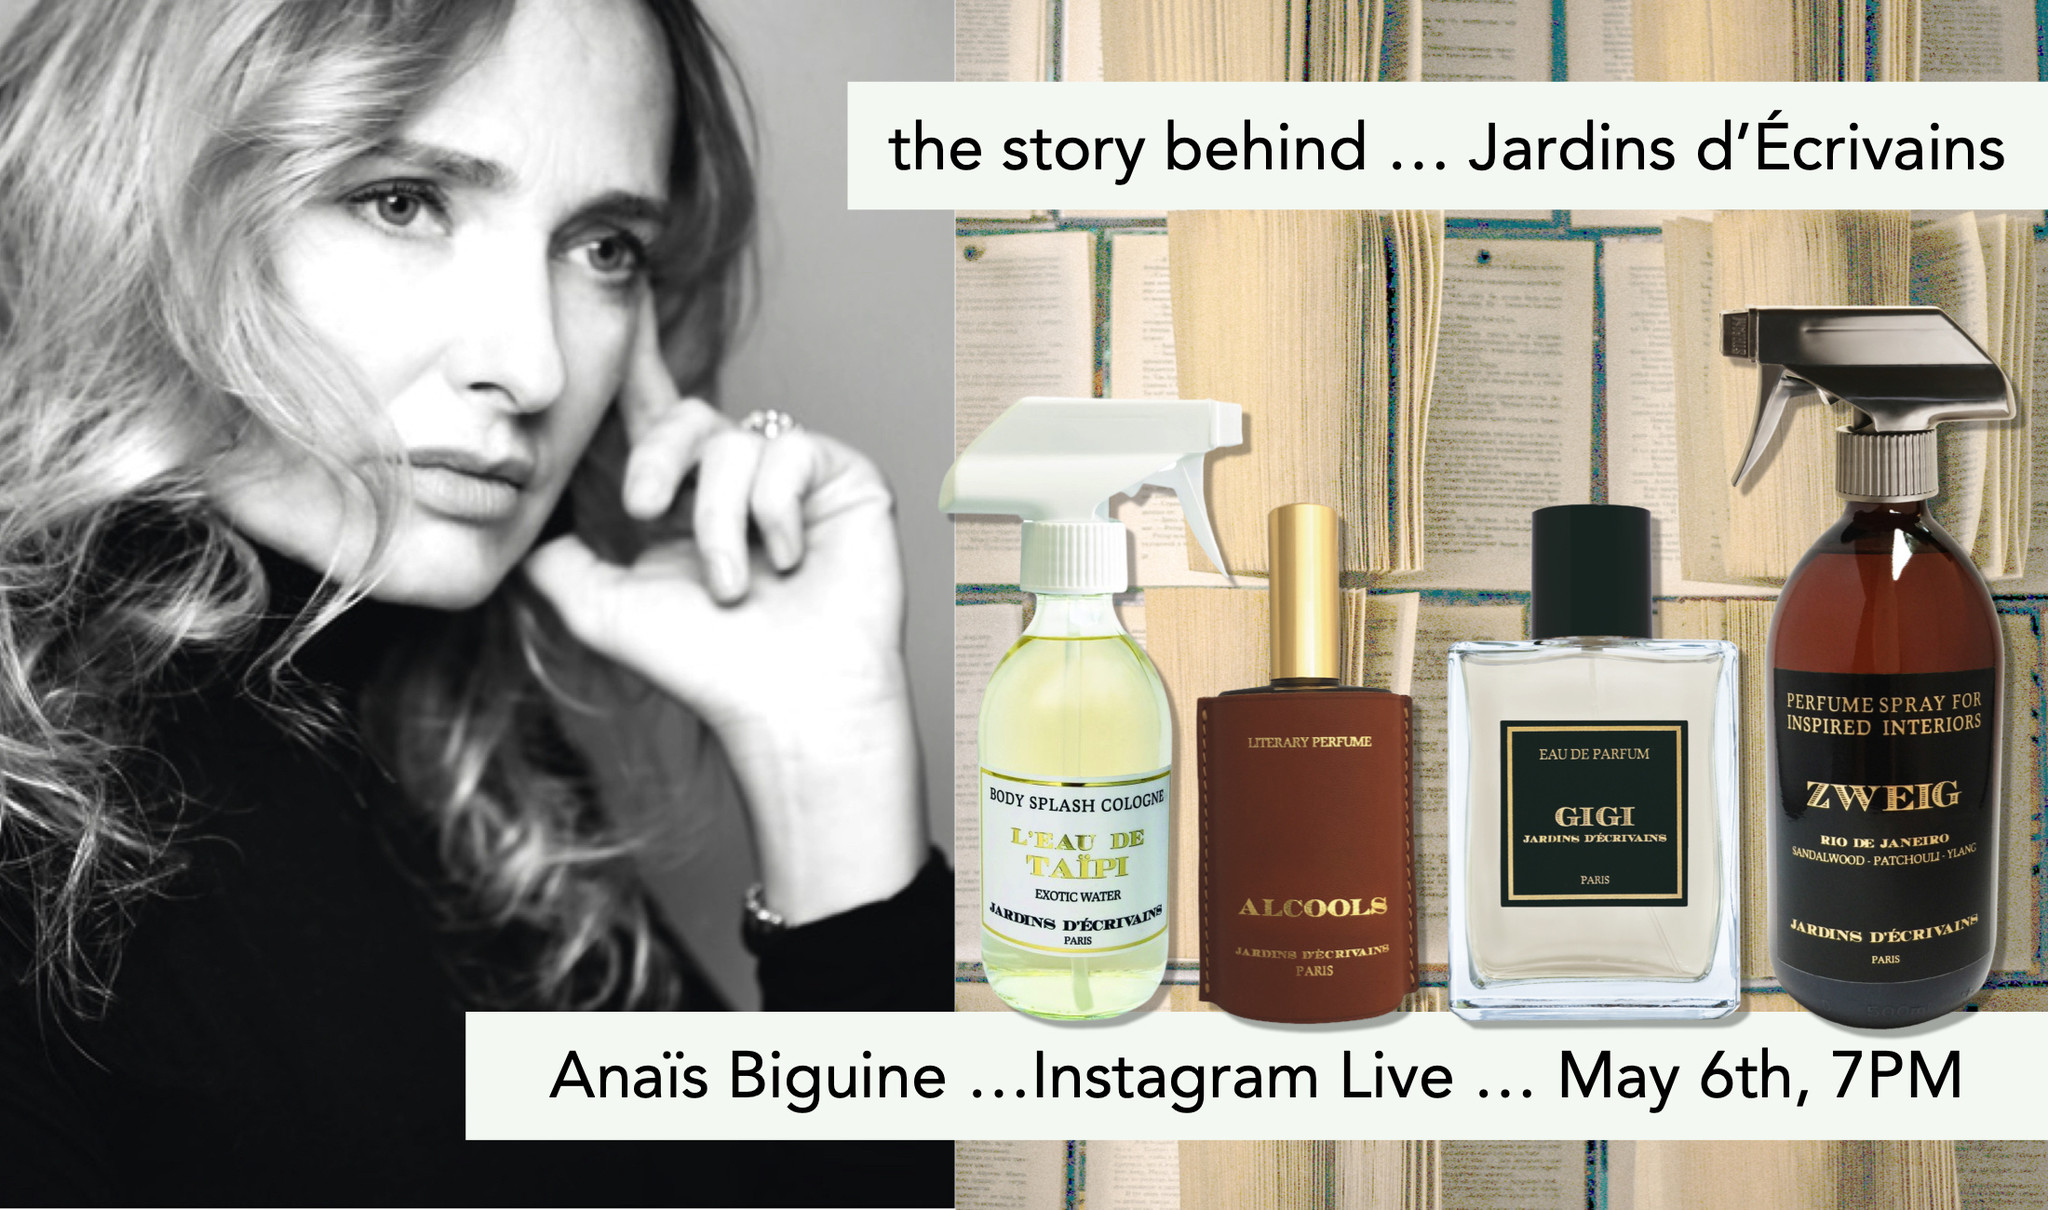 the story behind ... Jardins d'Écrivains